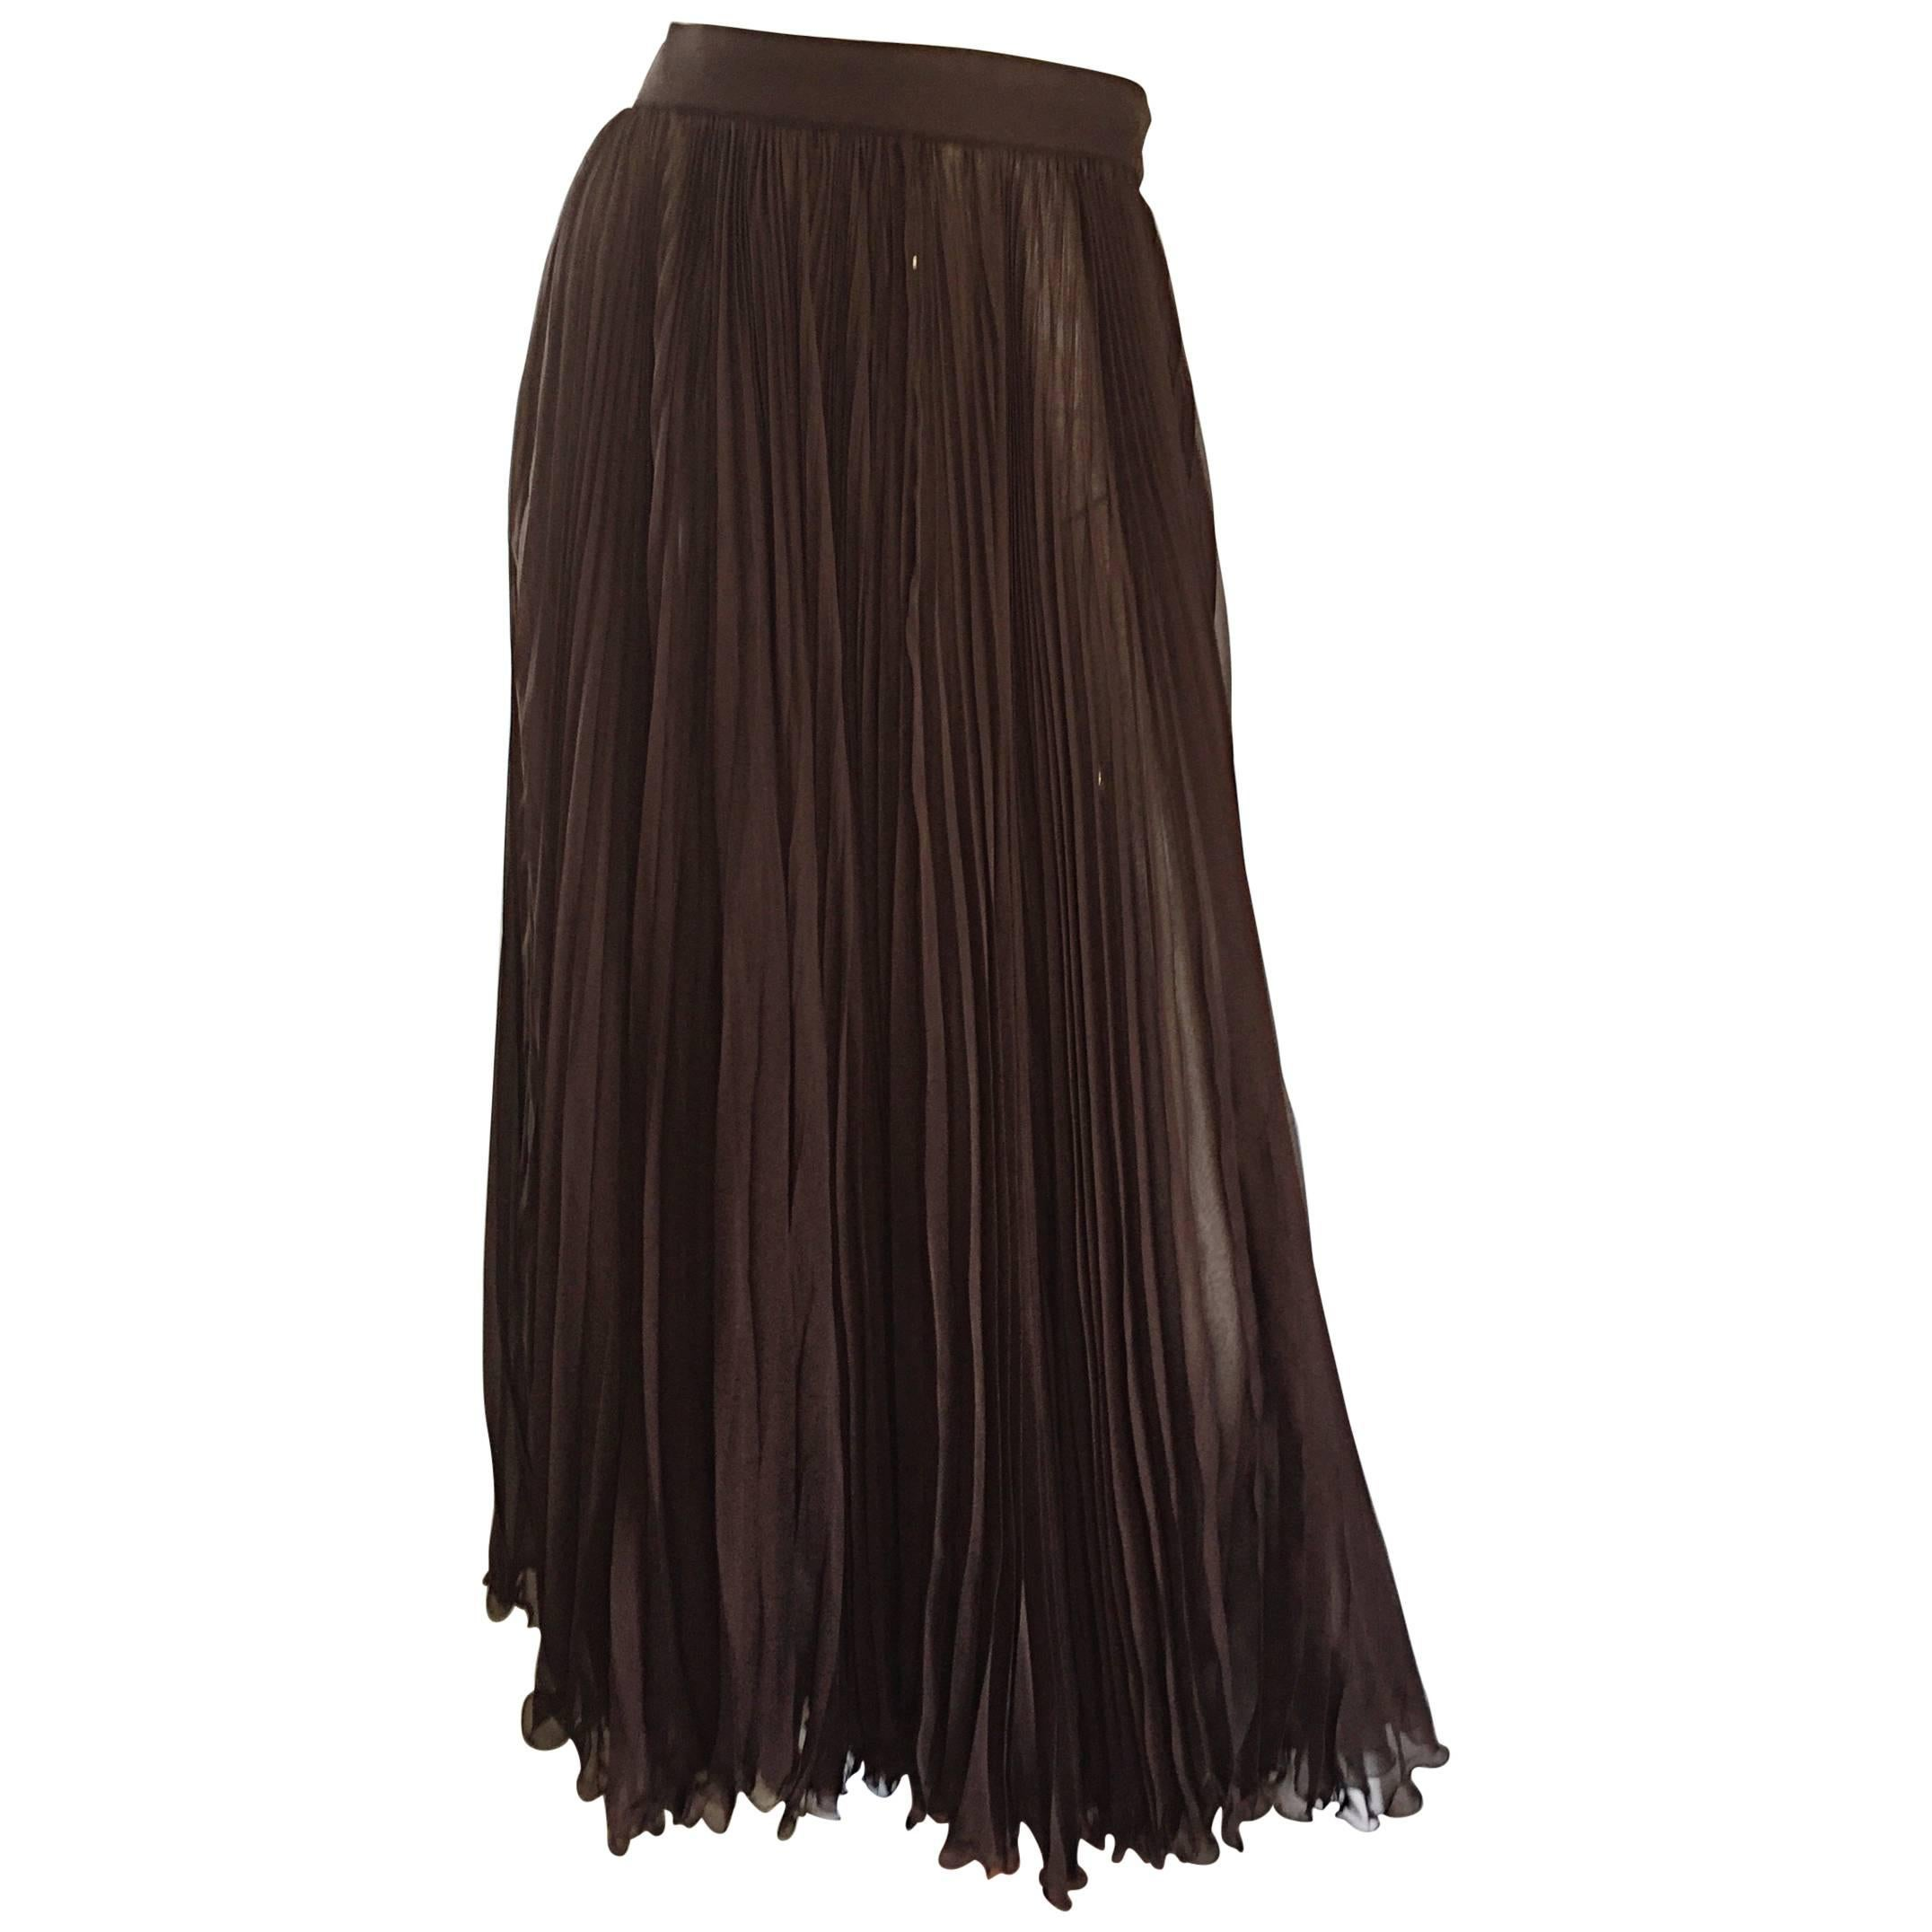 Exceptional Vintage Valentino Chocolate Brown Silk Chiffon Pleated Midi Skirt